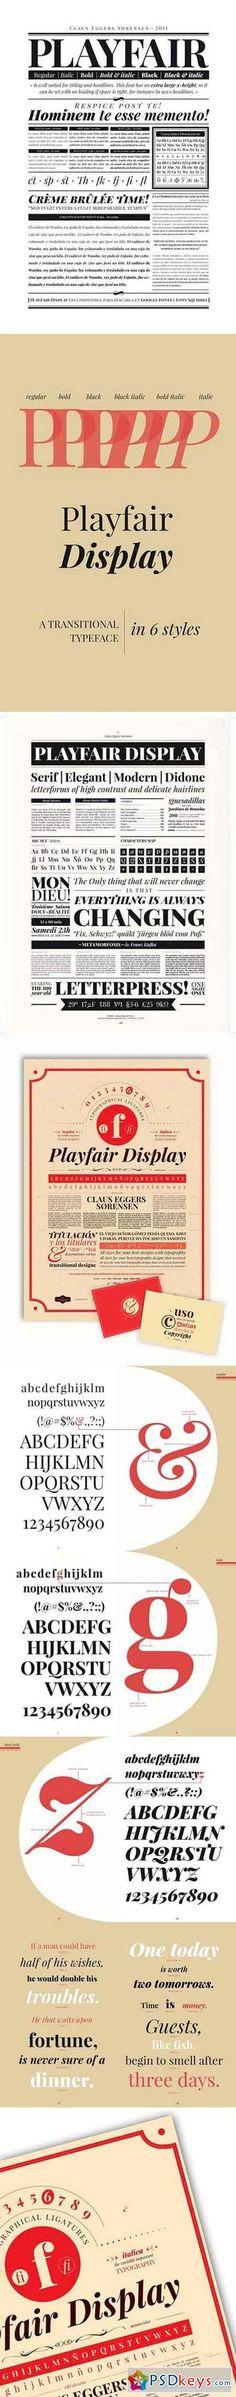 22 Best playfair display images in 2018   Fonts, Display